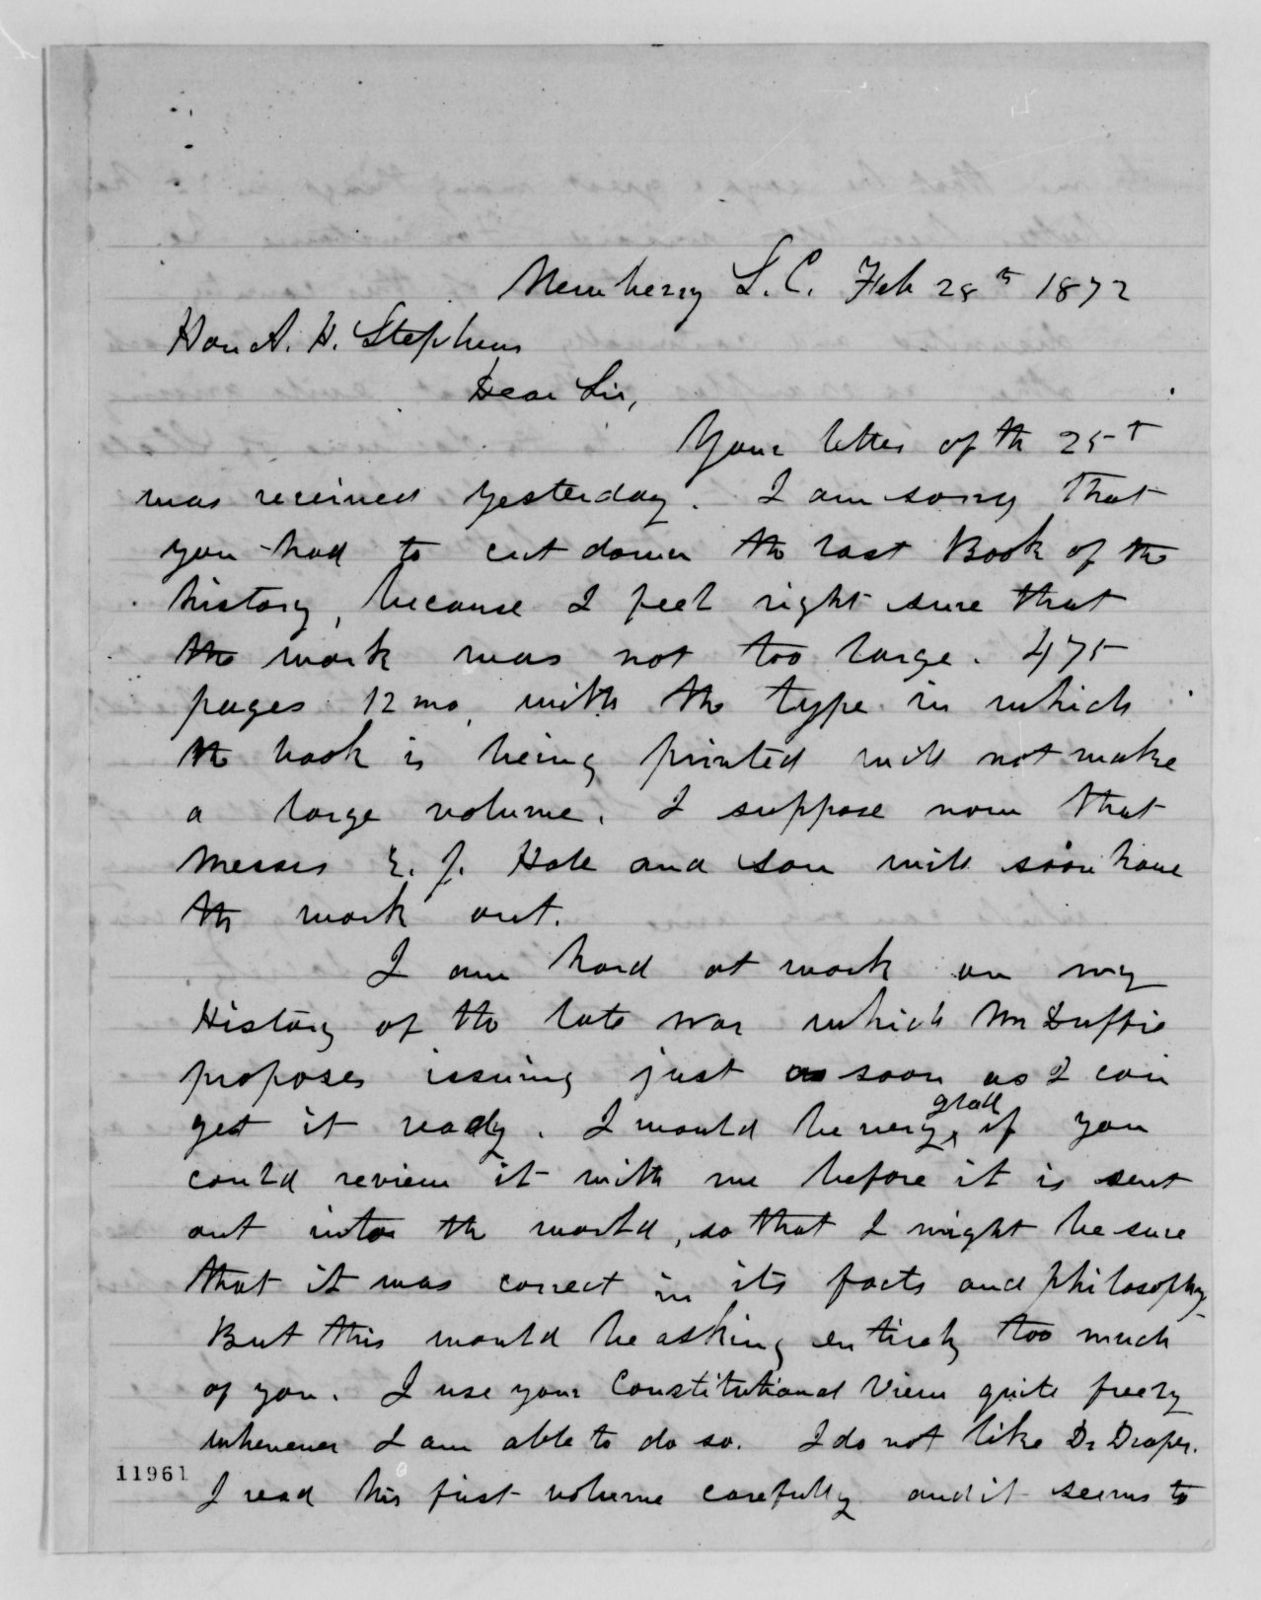 Alexander Hamilton Stephens Papers: General Correspondence, 1784-1886; 1872, Jan. 4-Feb. 28